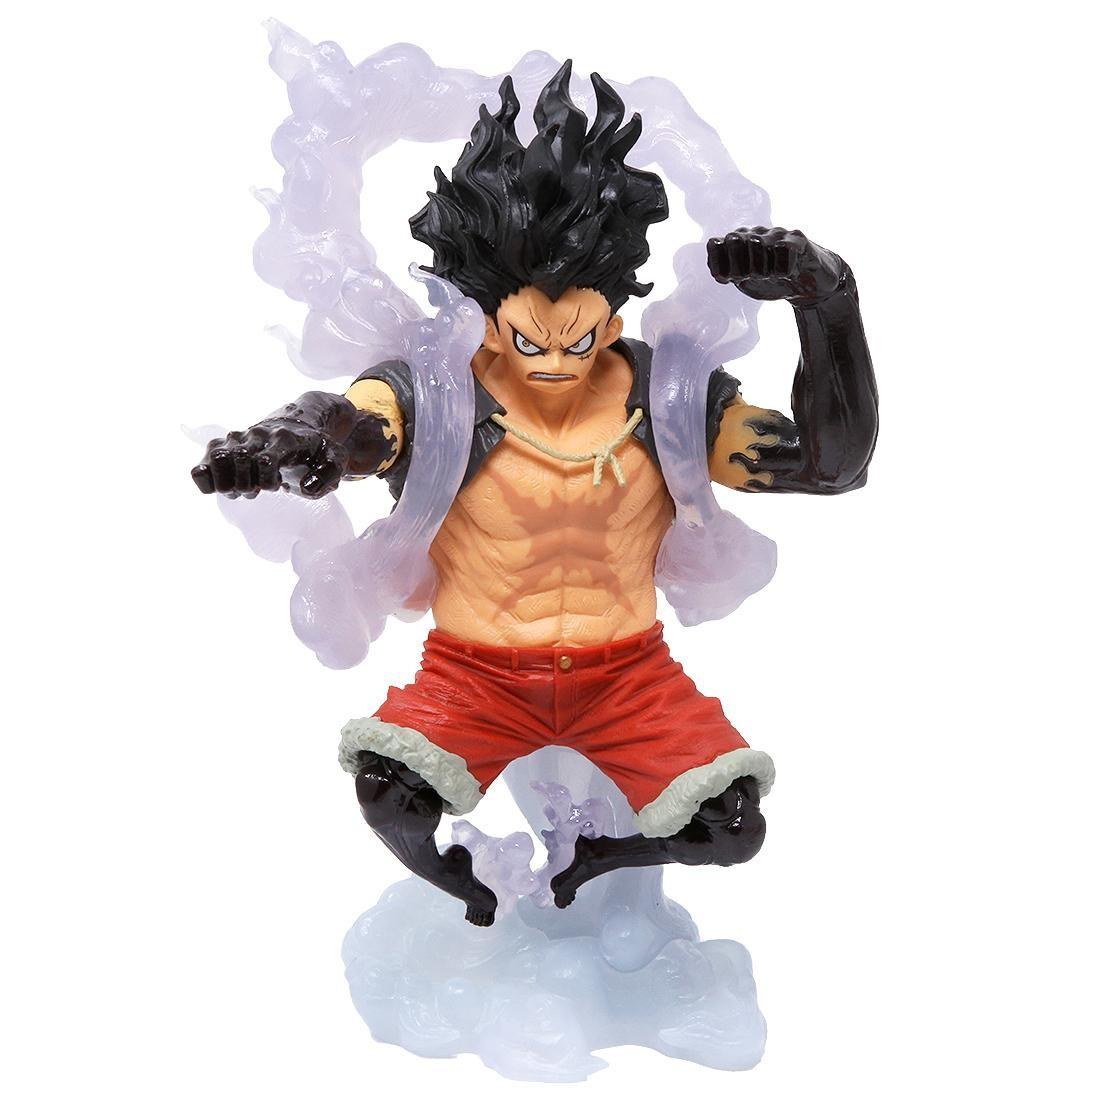 Luffy gear4 snakeman hd wallpaper background image. Banpresto One Piece King Of Artist Monkey D Luffy The Snakeman Figure White